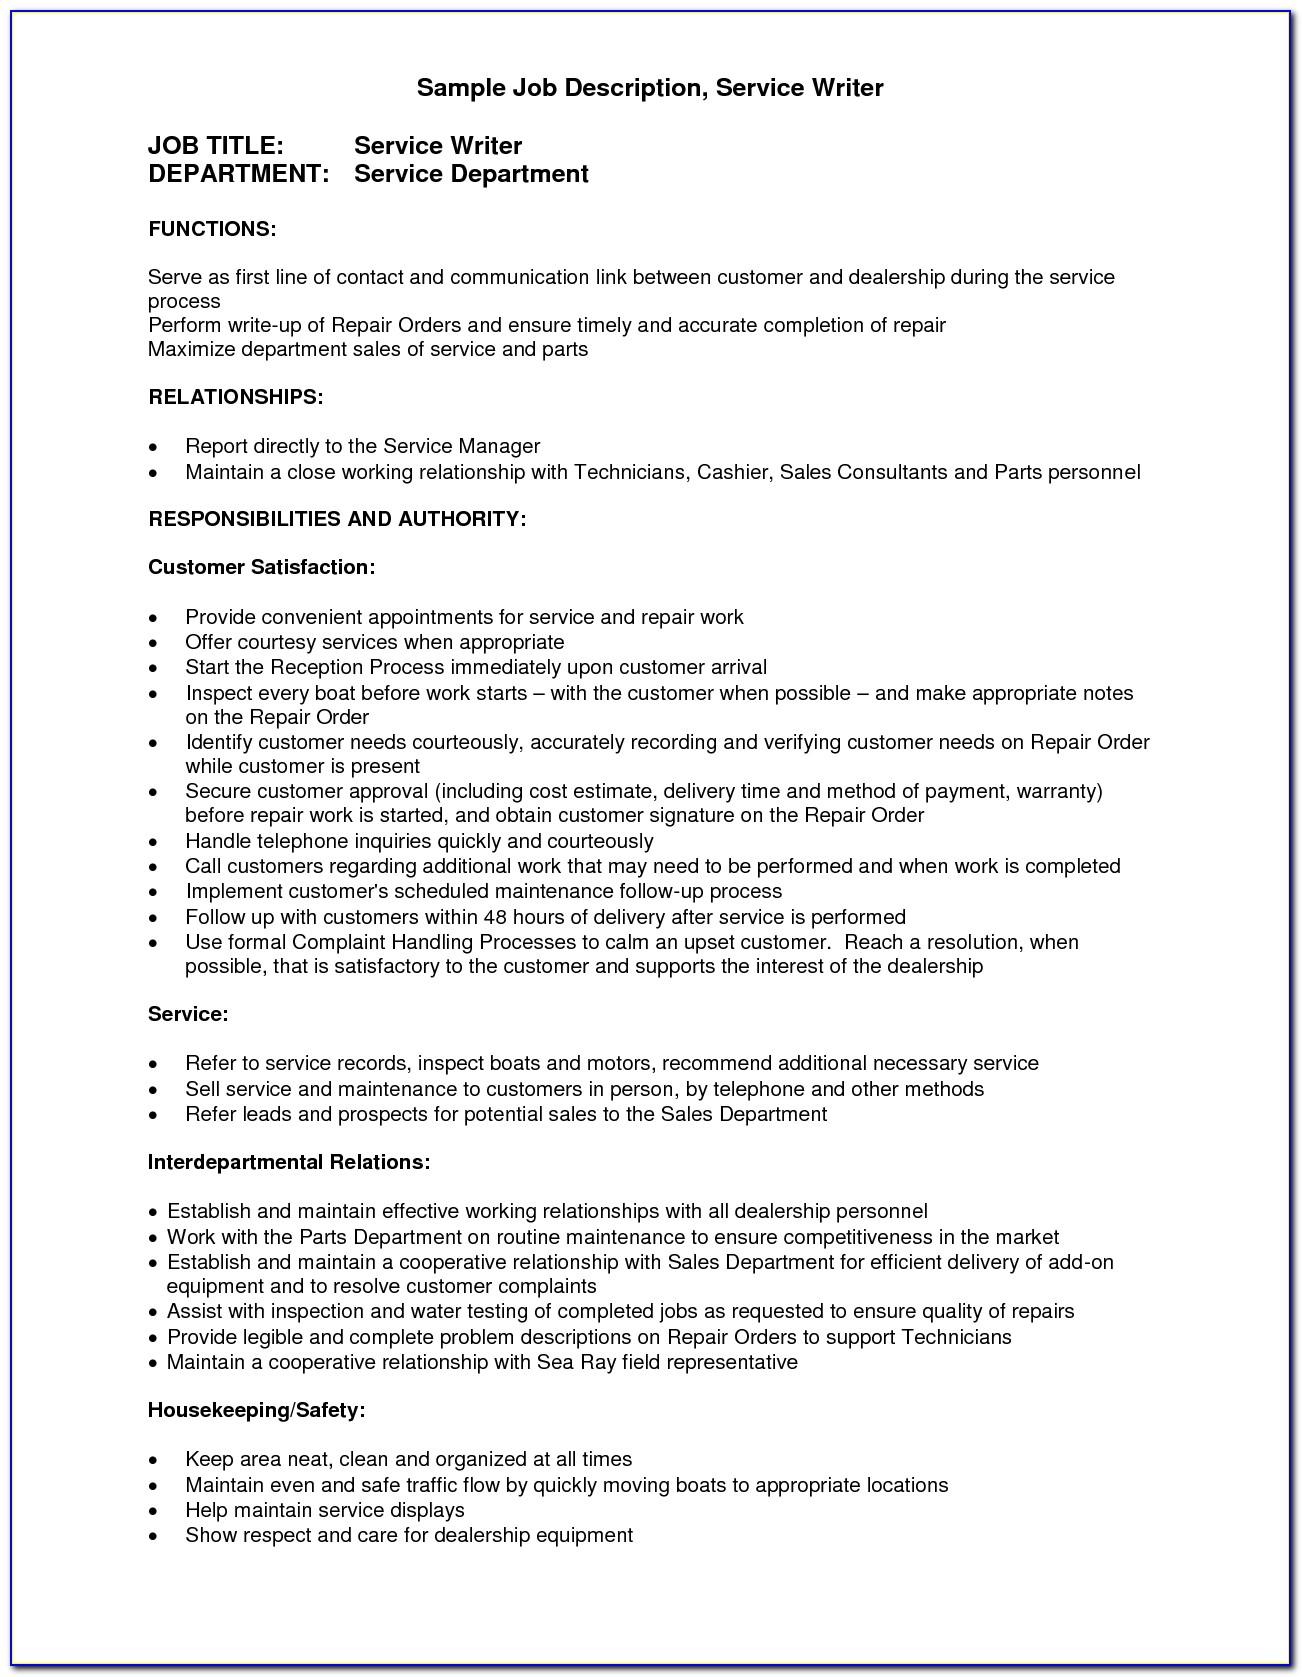 Skillful Design Resume Writer Service 11 Professional Resume Images